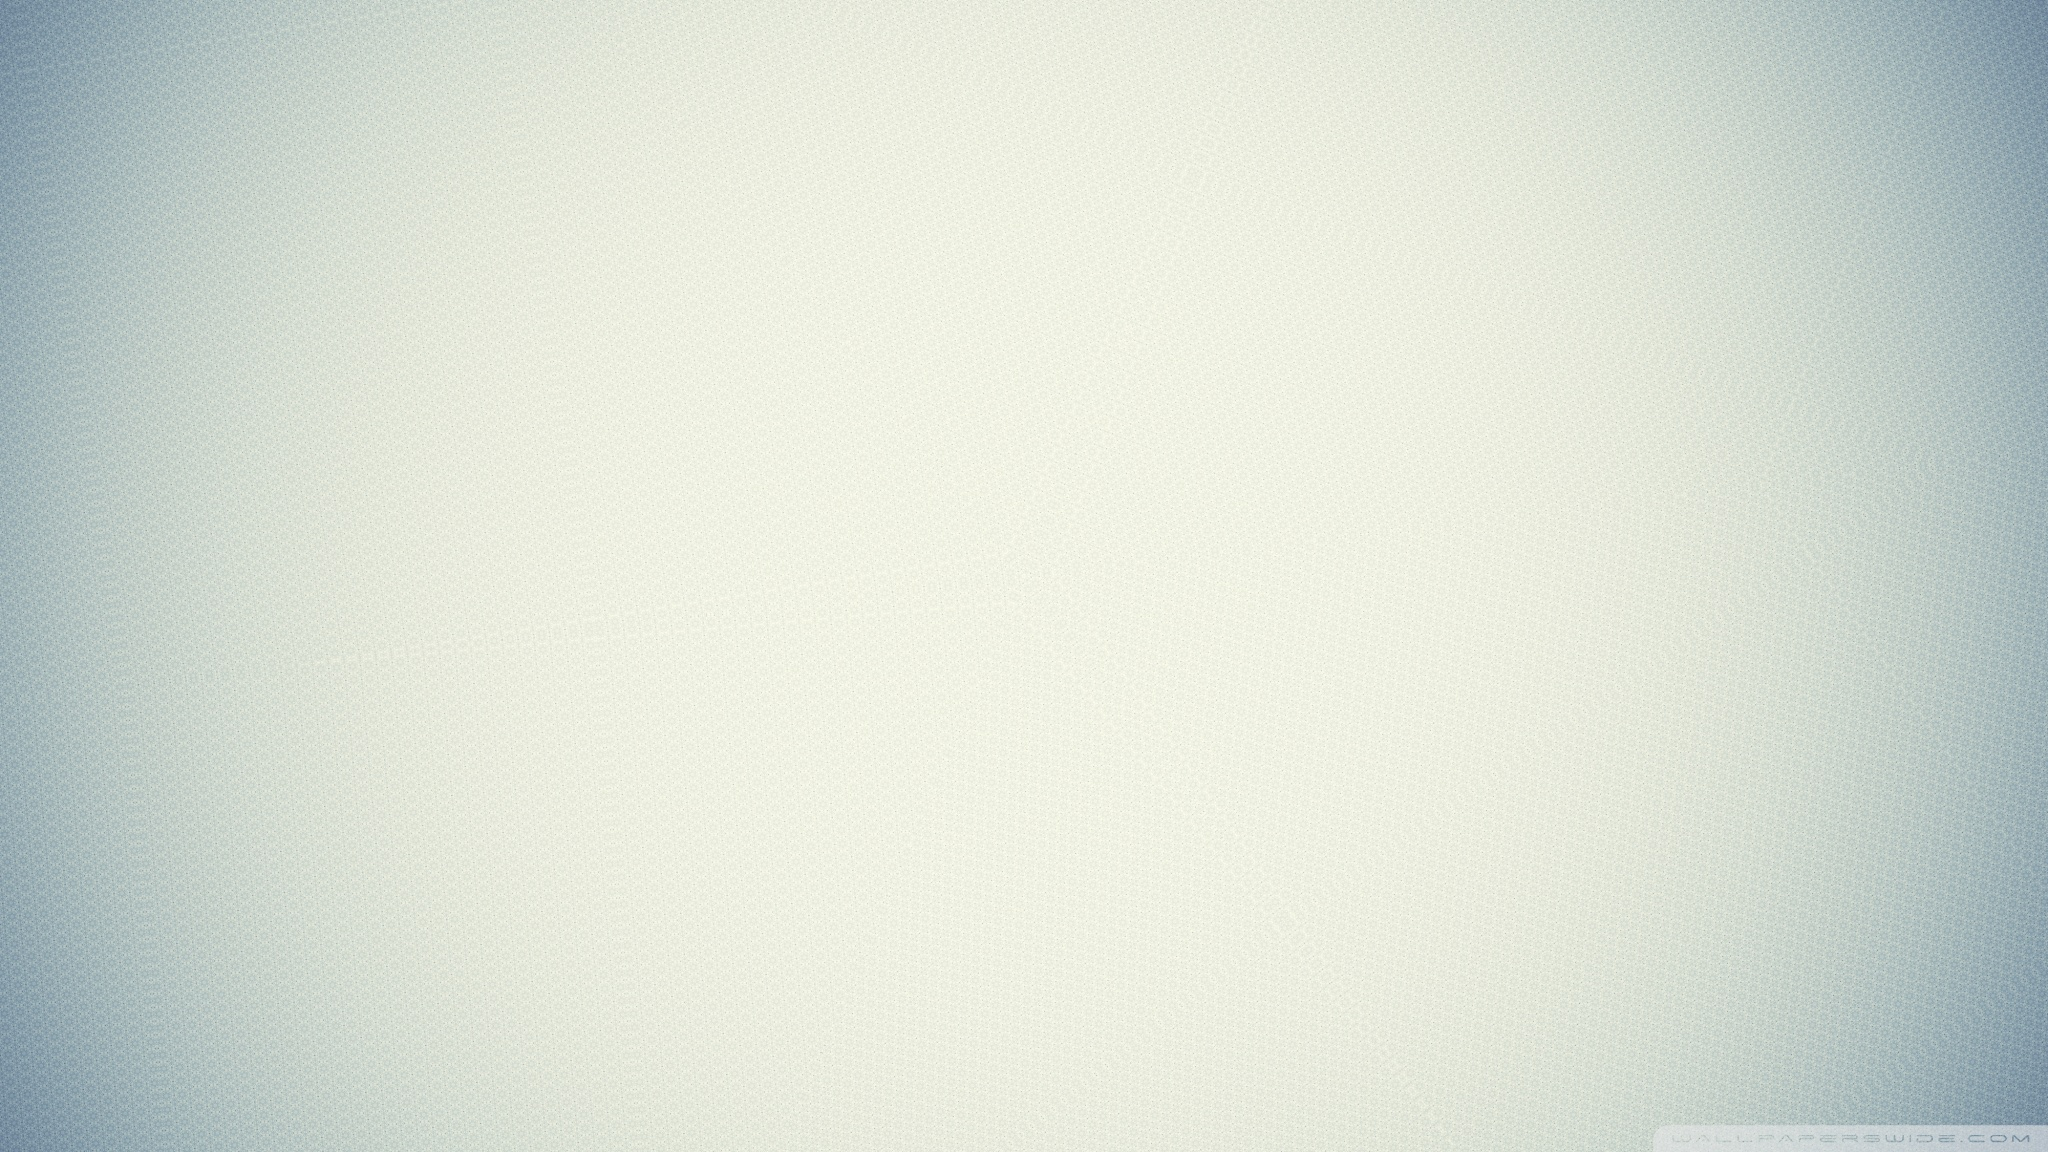 Light Background HD desktop wallpaper : High Definition : Mobile